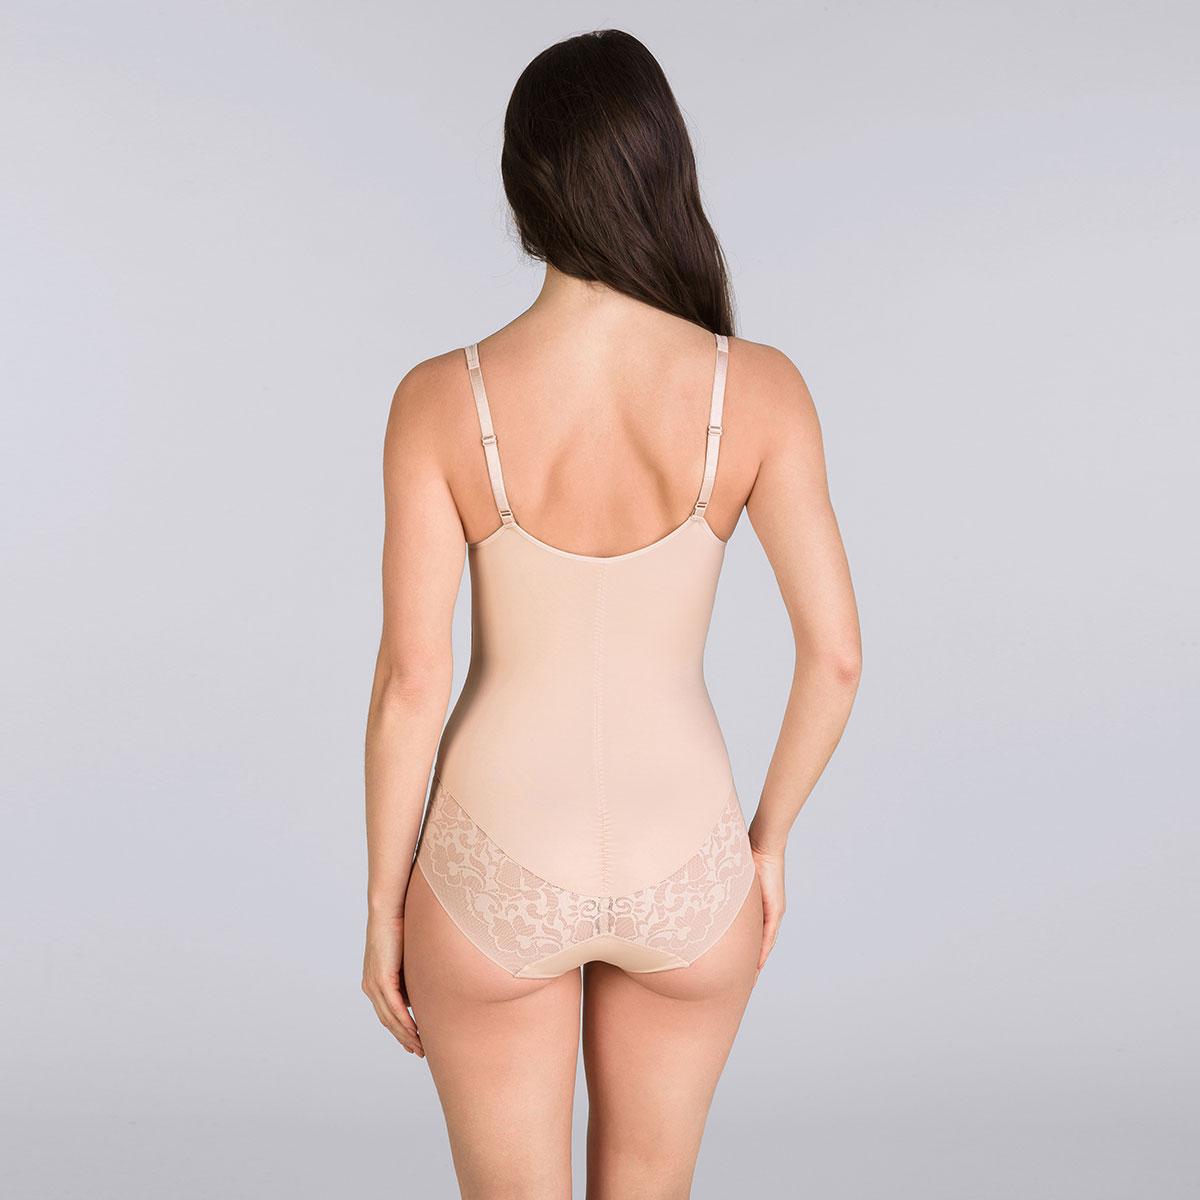 Beige Shaping Body - Expert in Silhouette, , PLAYTEX